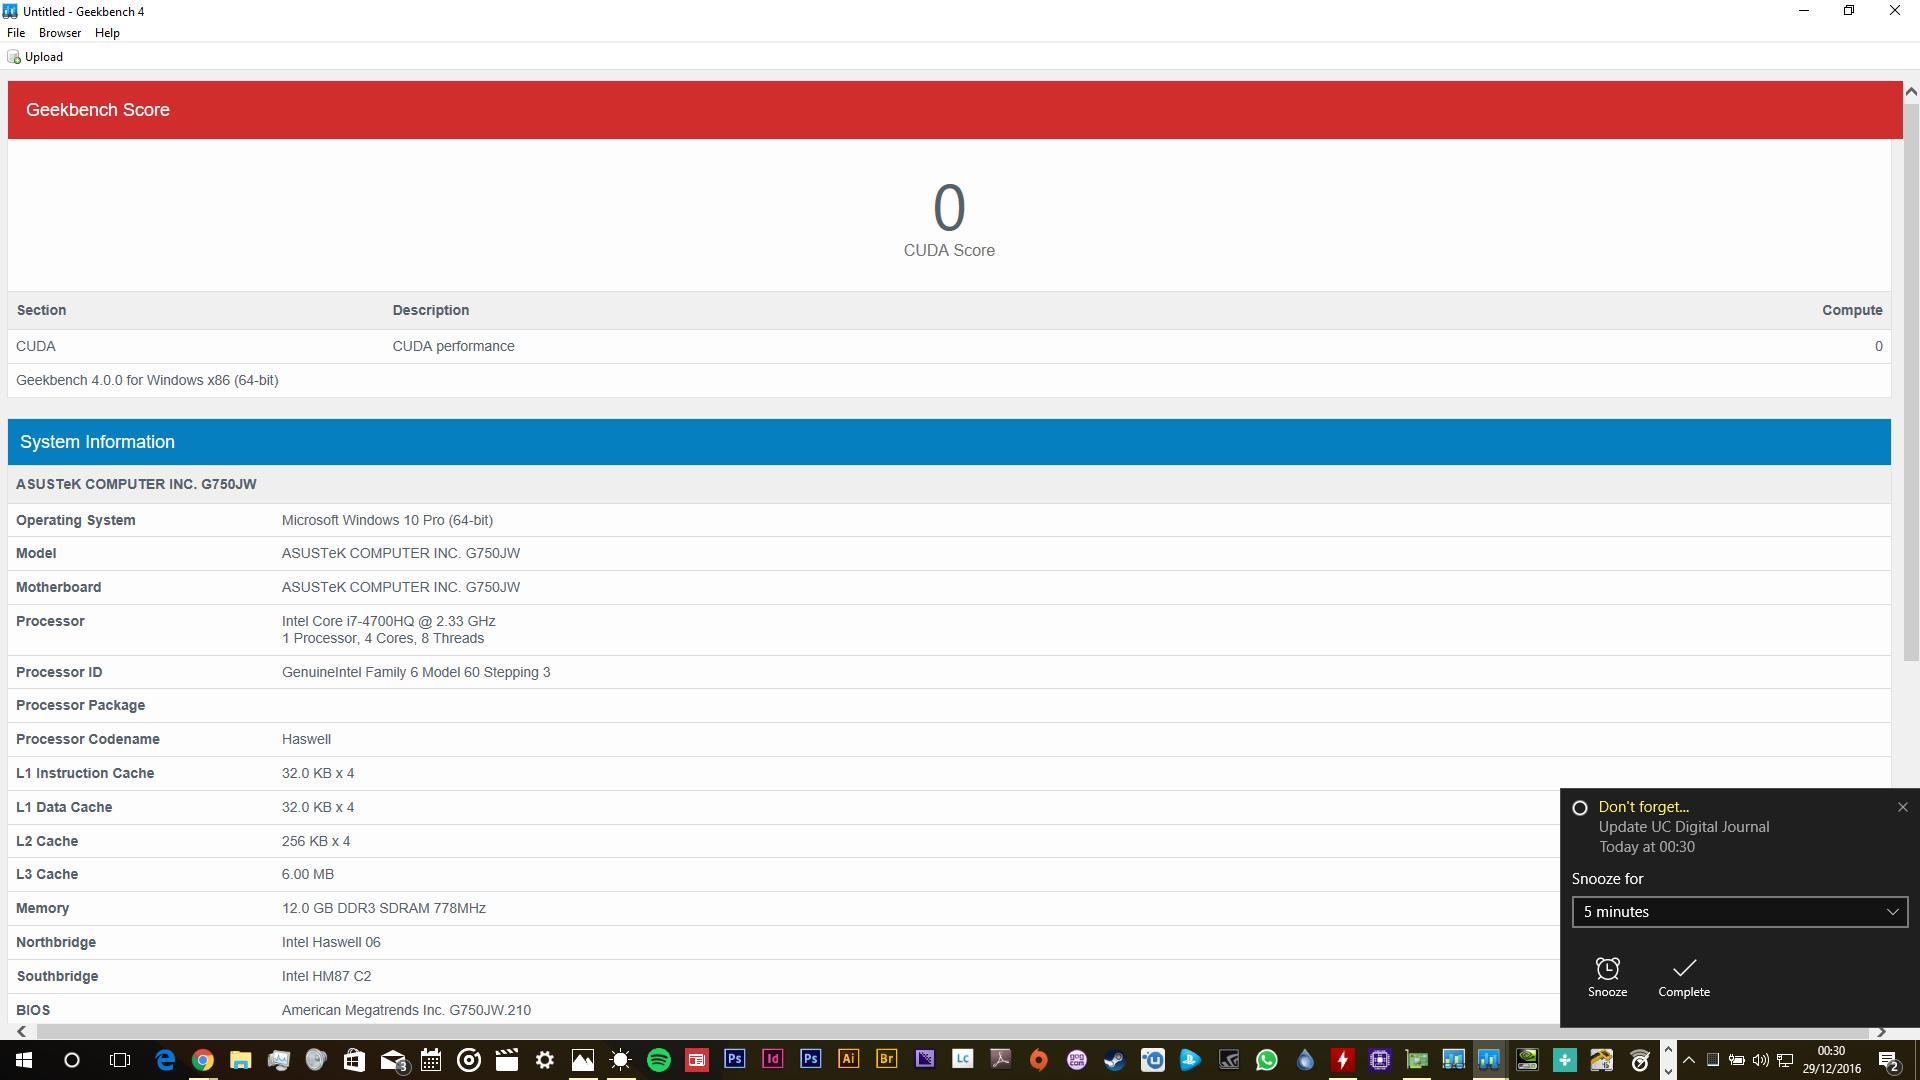 Geekbench 4 Compute tests CUDA / OpenCL showing zero score